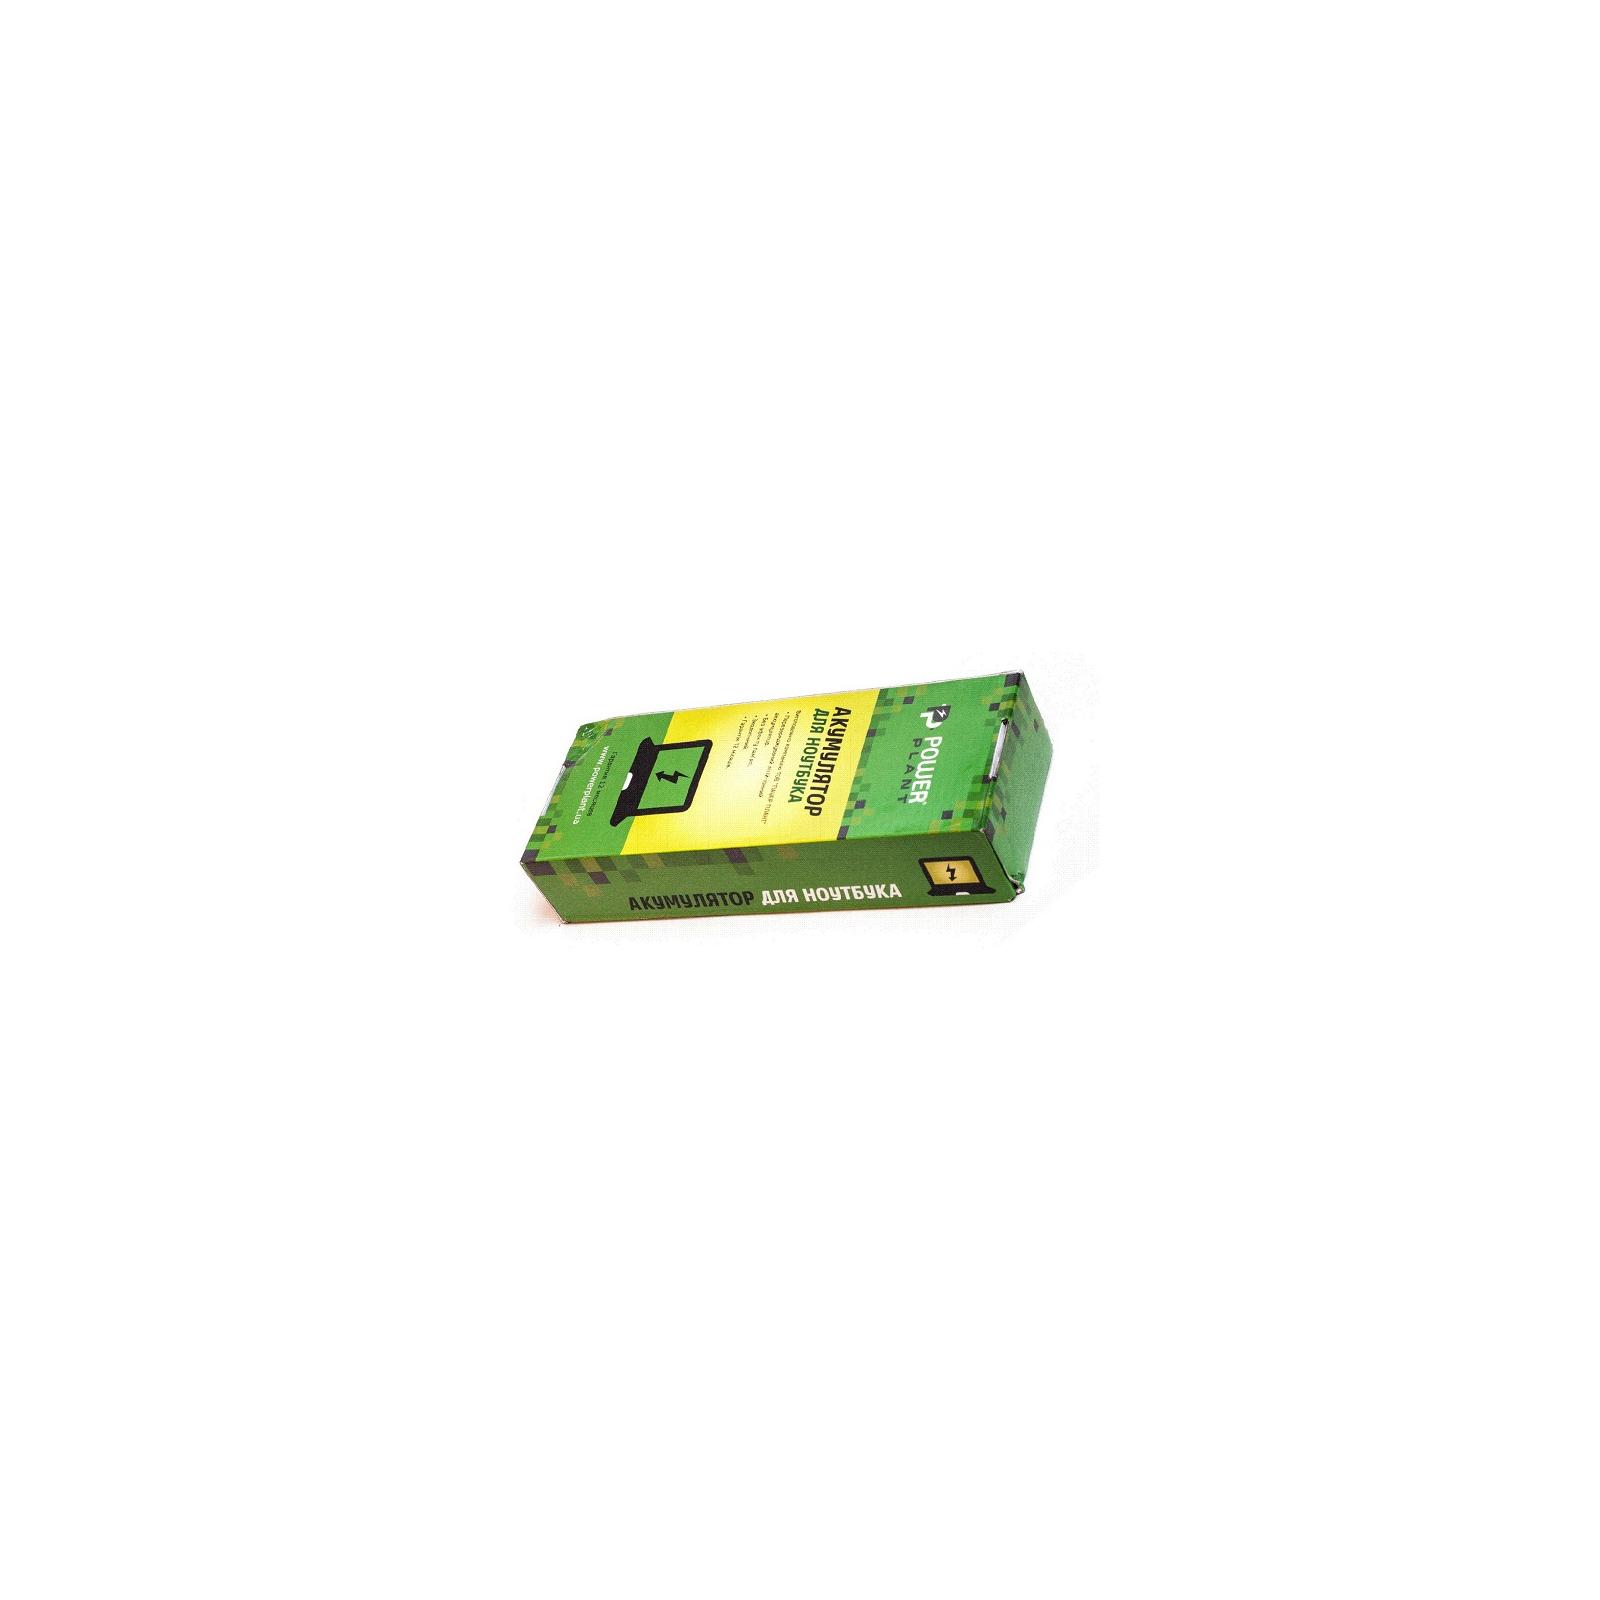 Аккумулятор для ноутбука HP CQ14 OA04 (HSTNN-LB5Y) 14.8V 2600mAh PowerPlant (NB00000295) изображение 3